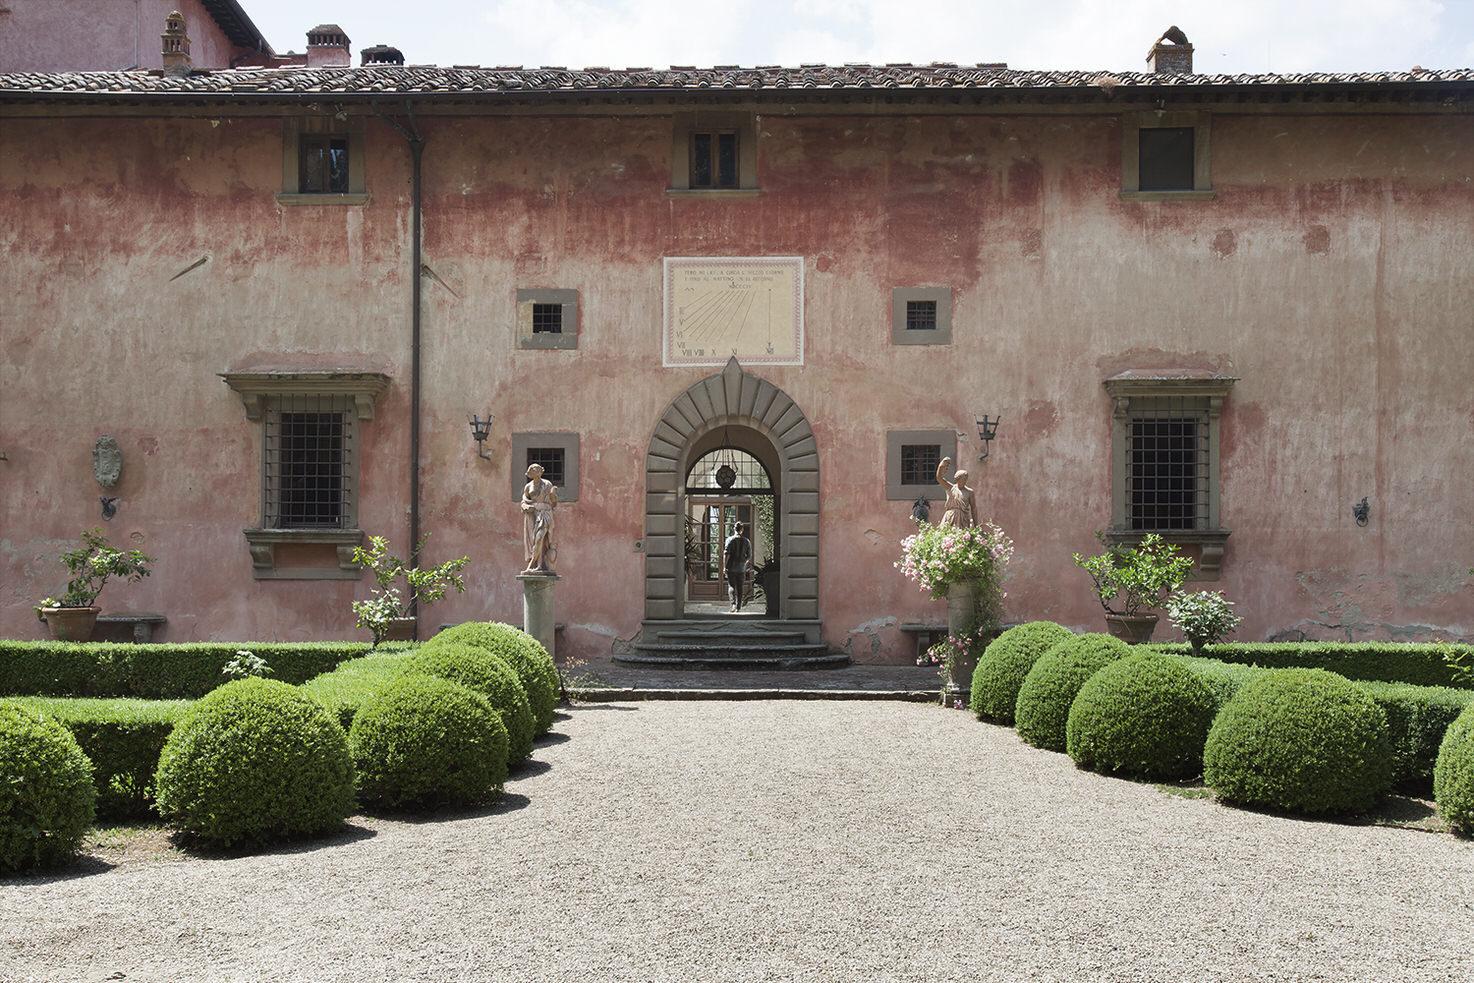 Façade of Villa Vignamaggio